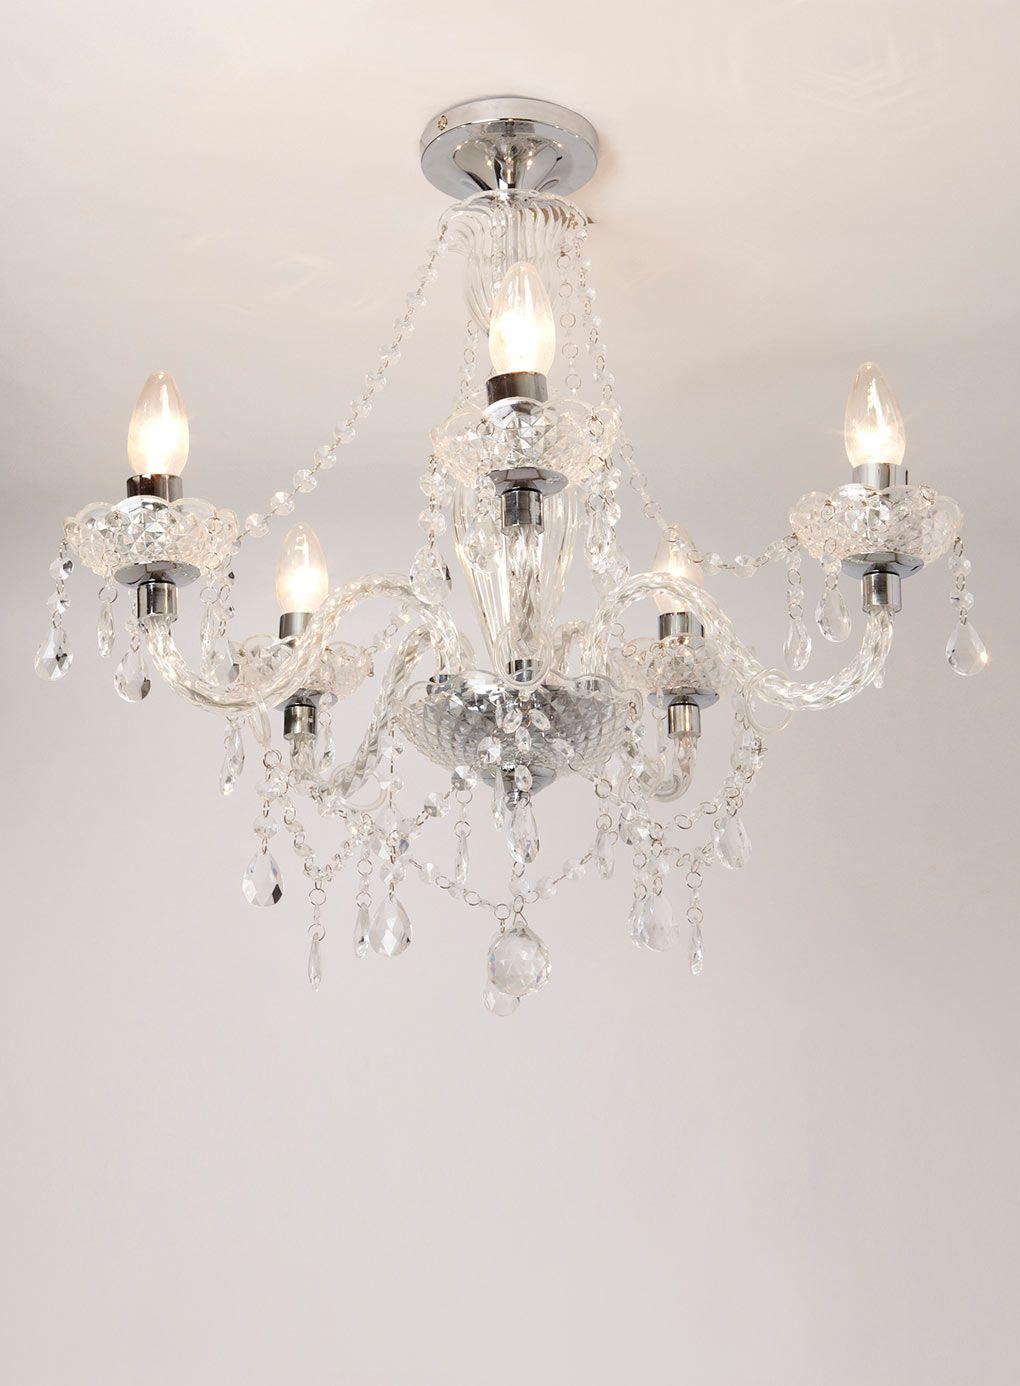 Chandelier Ceiling Lights Home Lighting Bedroom